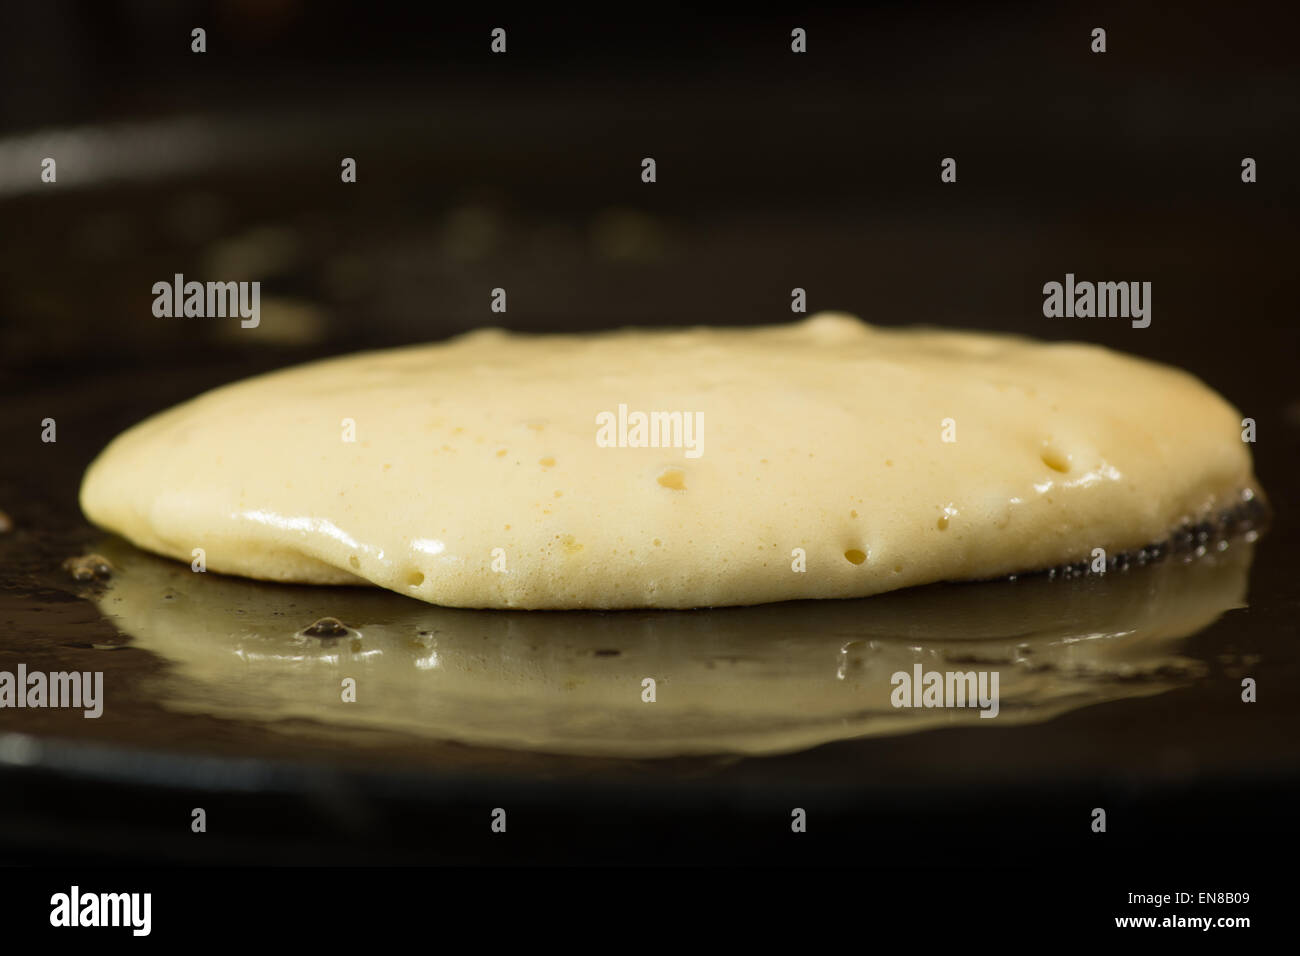 making a fluffy american/scotch style pancake - batter just beginning to rise Stock Photo